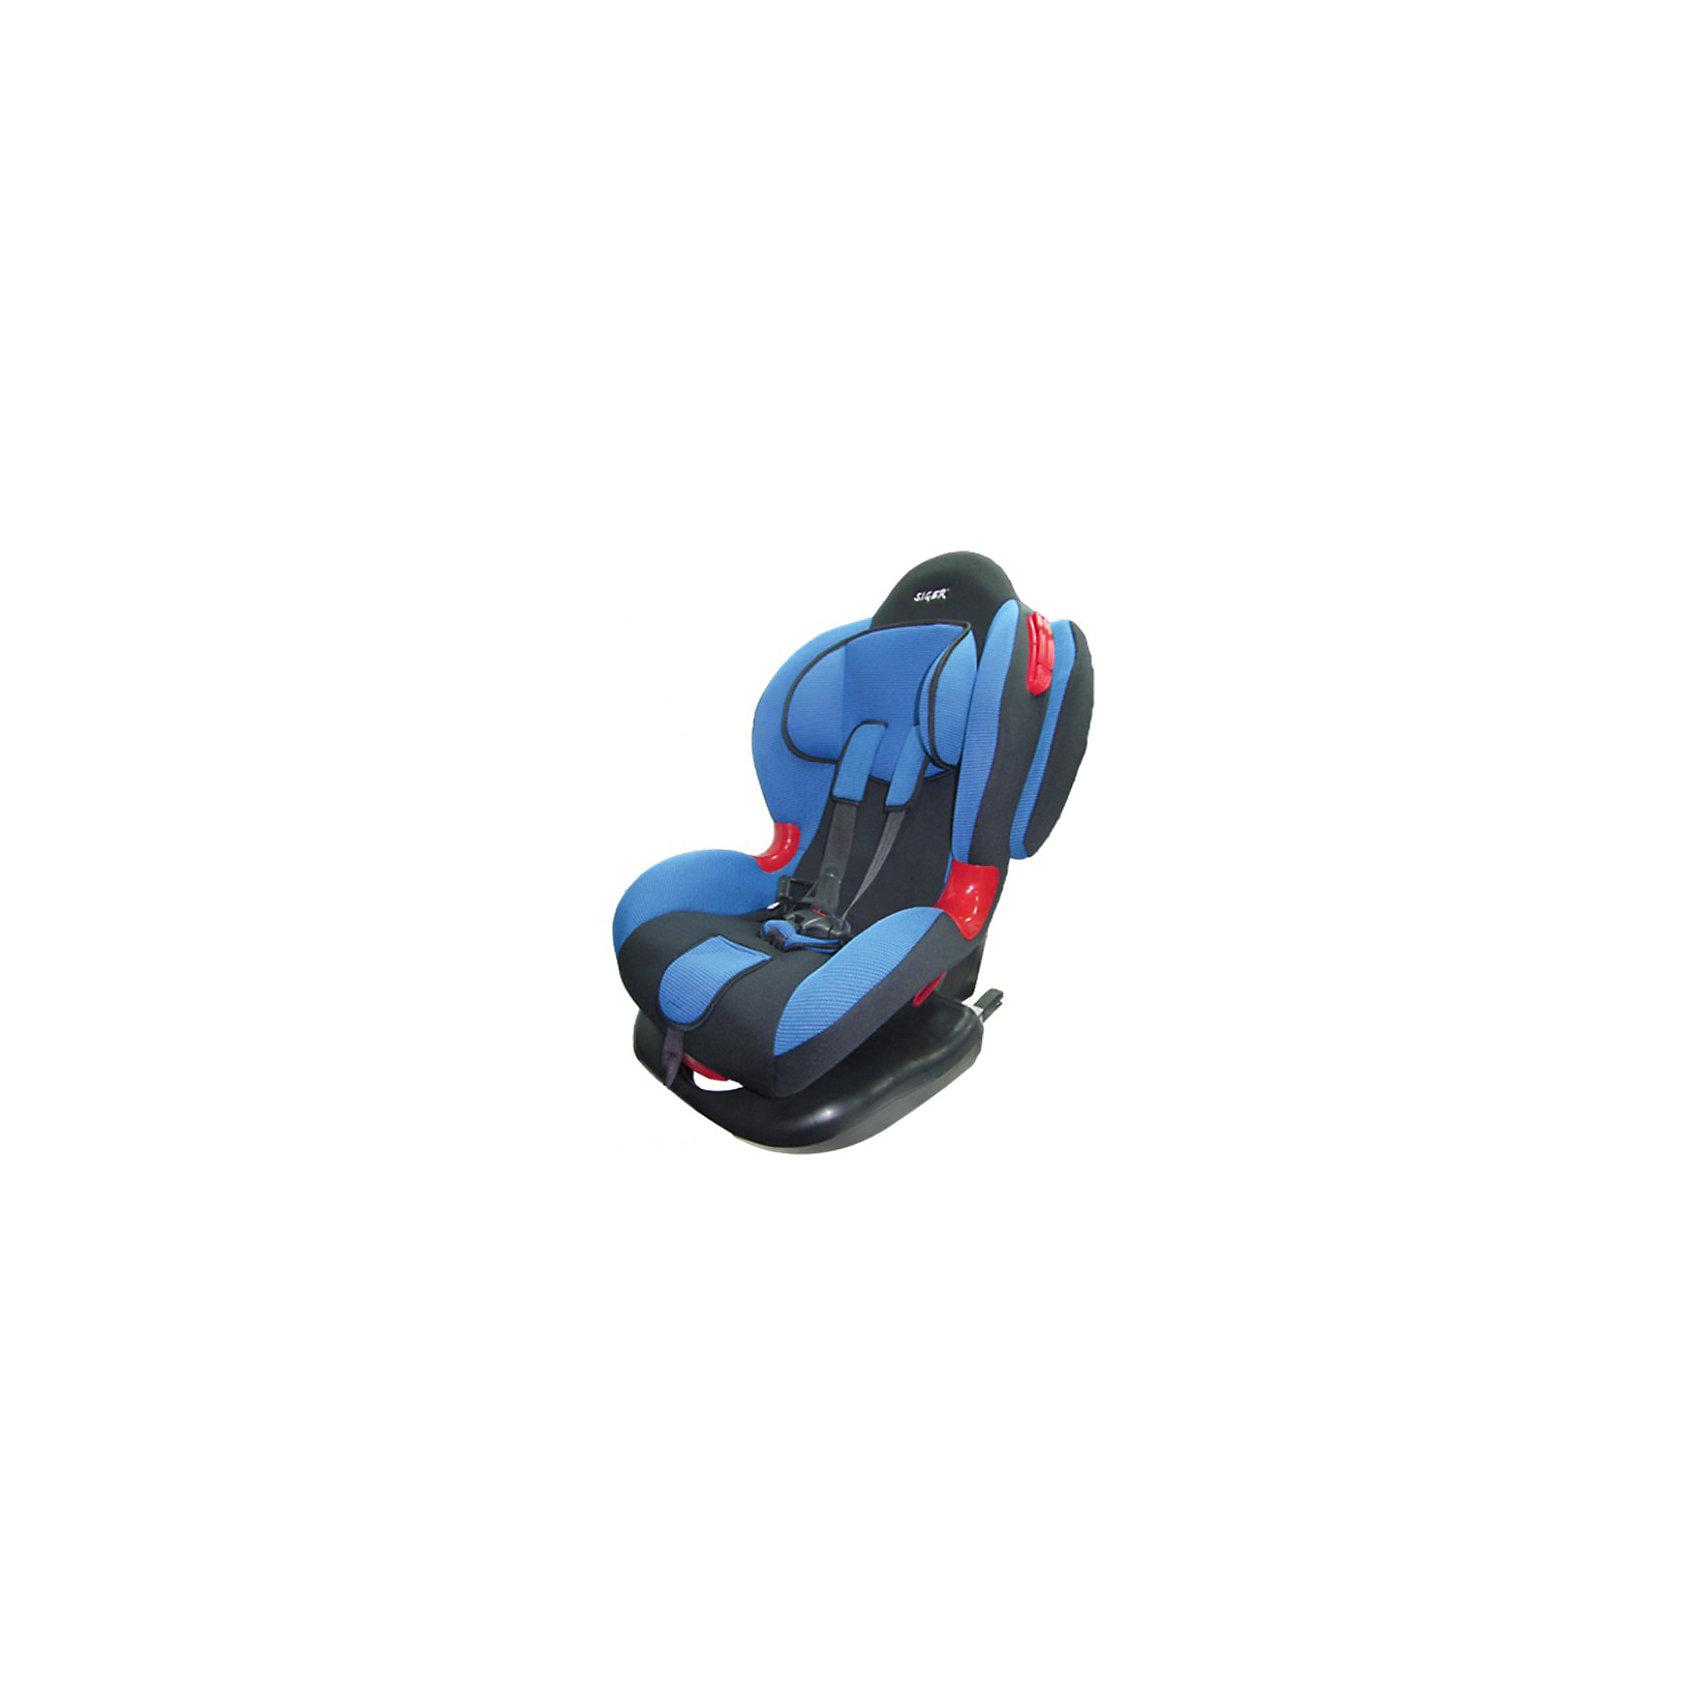 Автокресло Кокон-Isofix, 9-25 кг., SIGER, синий